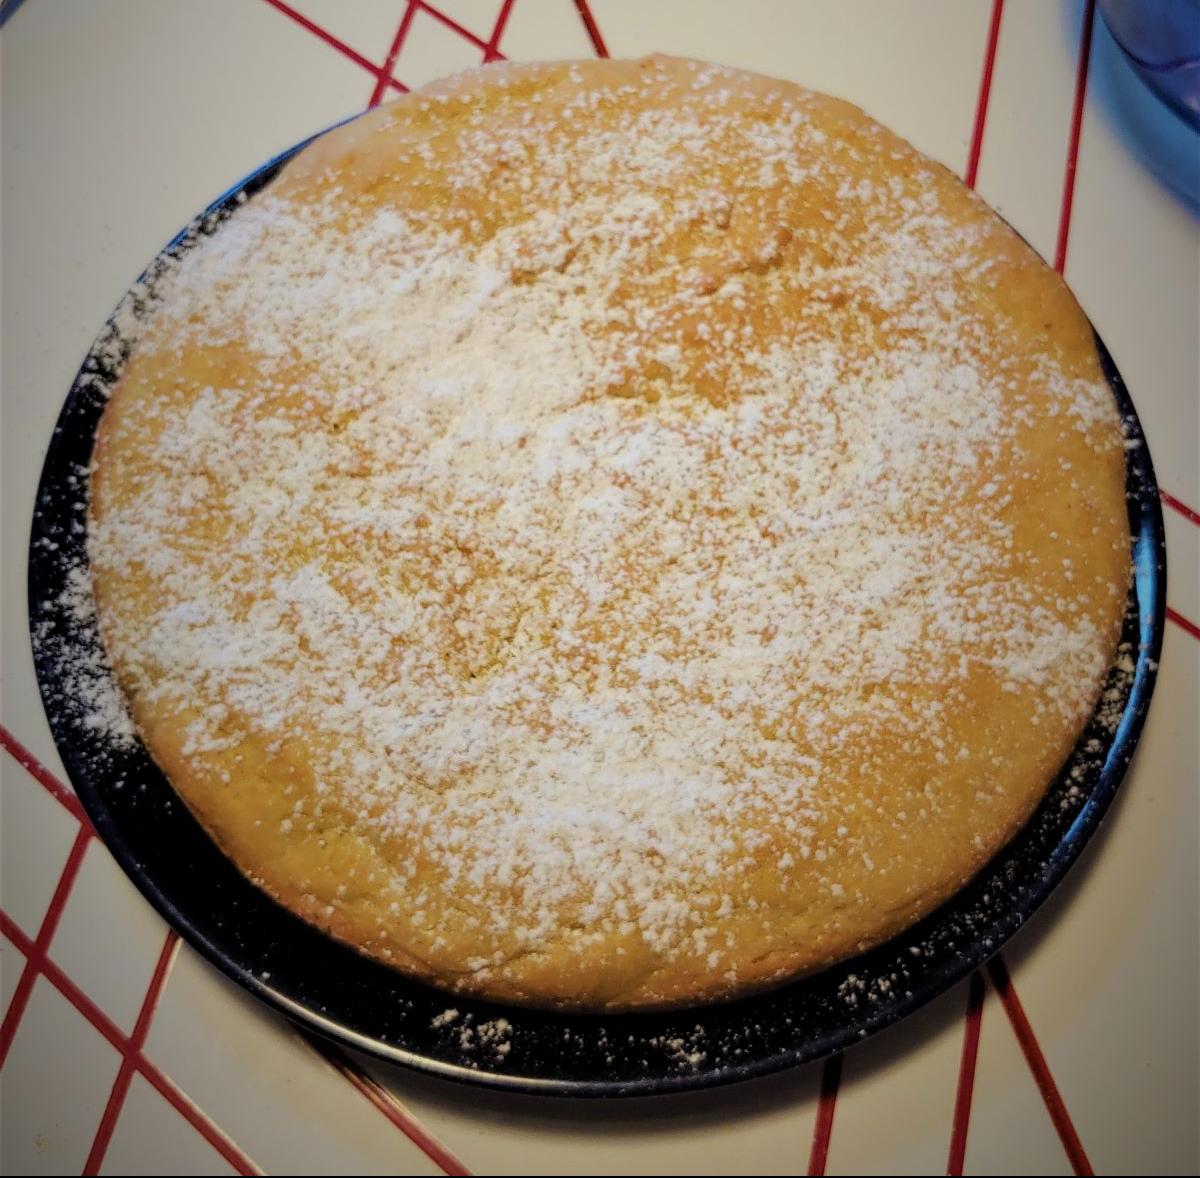 Breakfast cake with powdered sugar